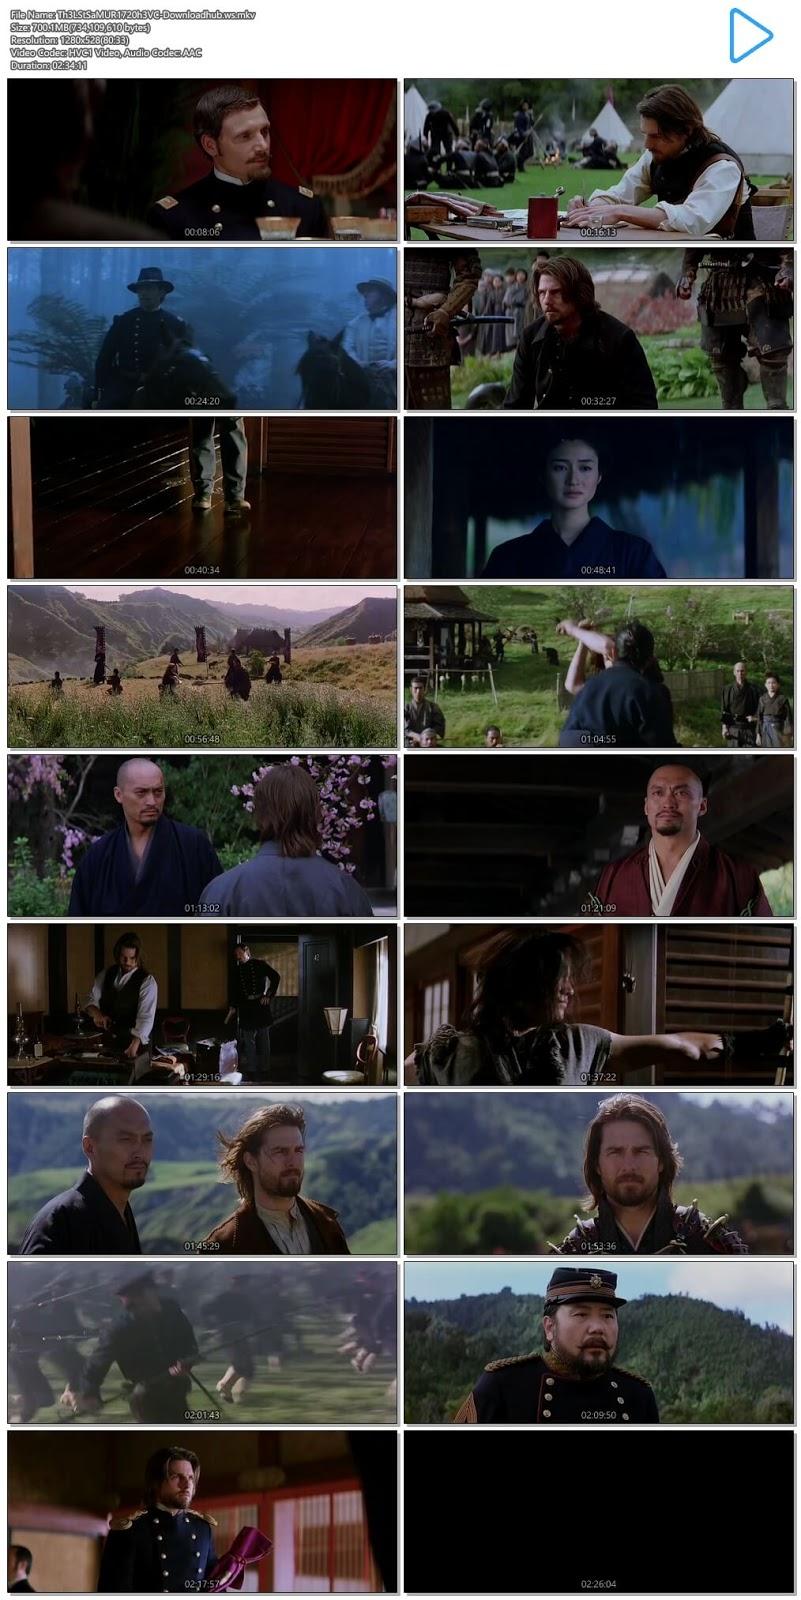 The Last Samurai 2003 Hindi Dual Audio 720p HEVC BluRay Free